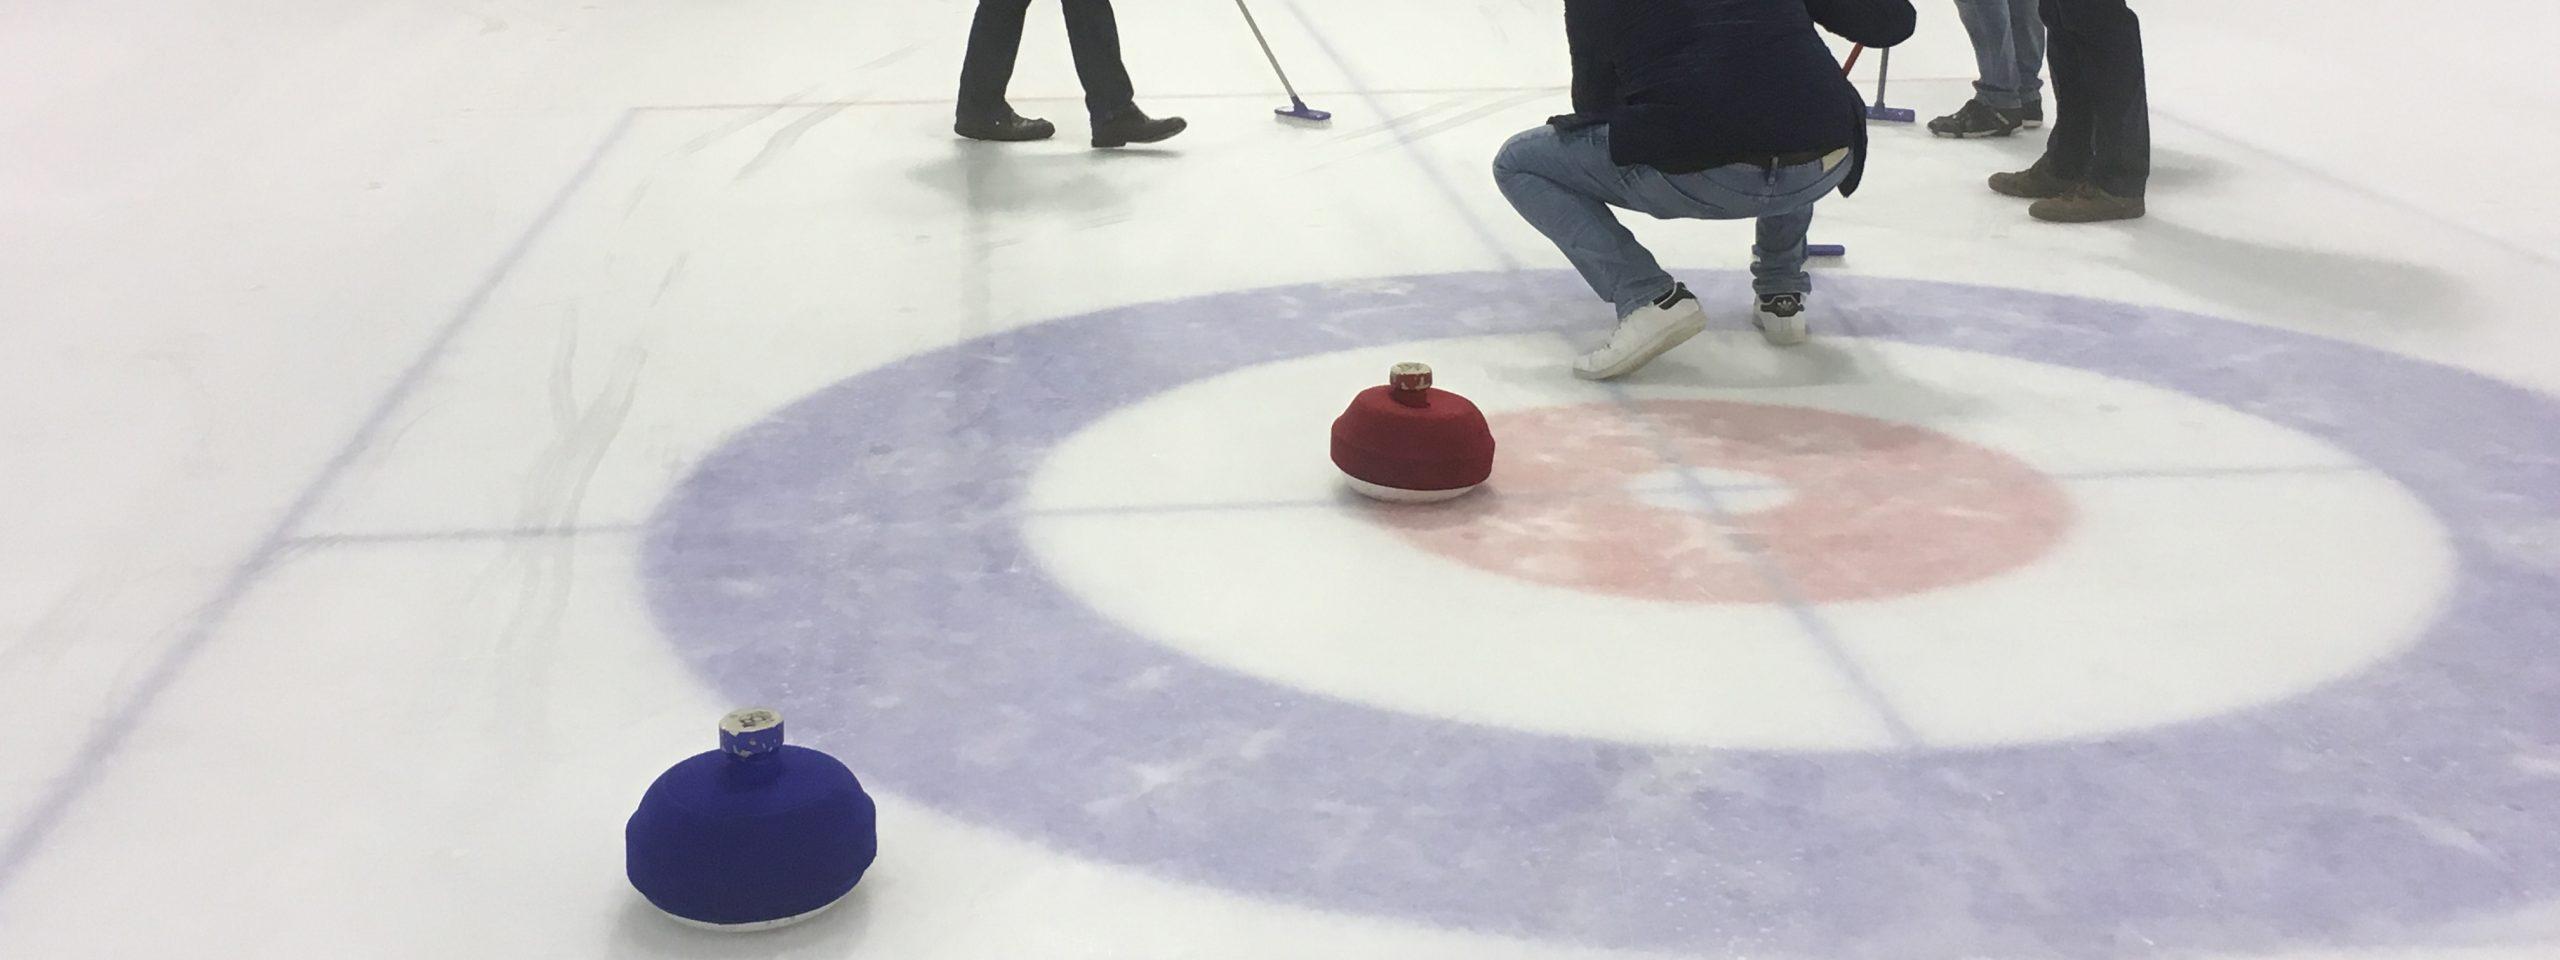 teamuitje-den-bosch-winteruitjes-curling